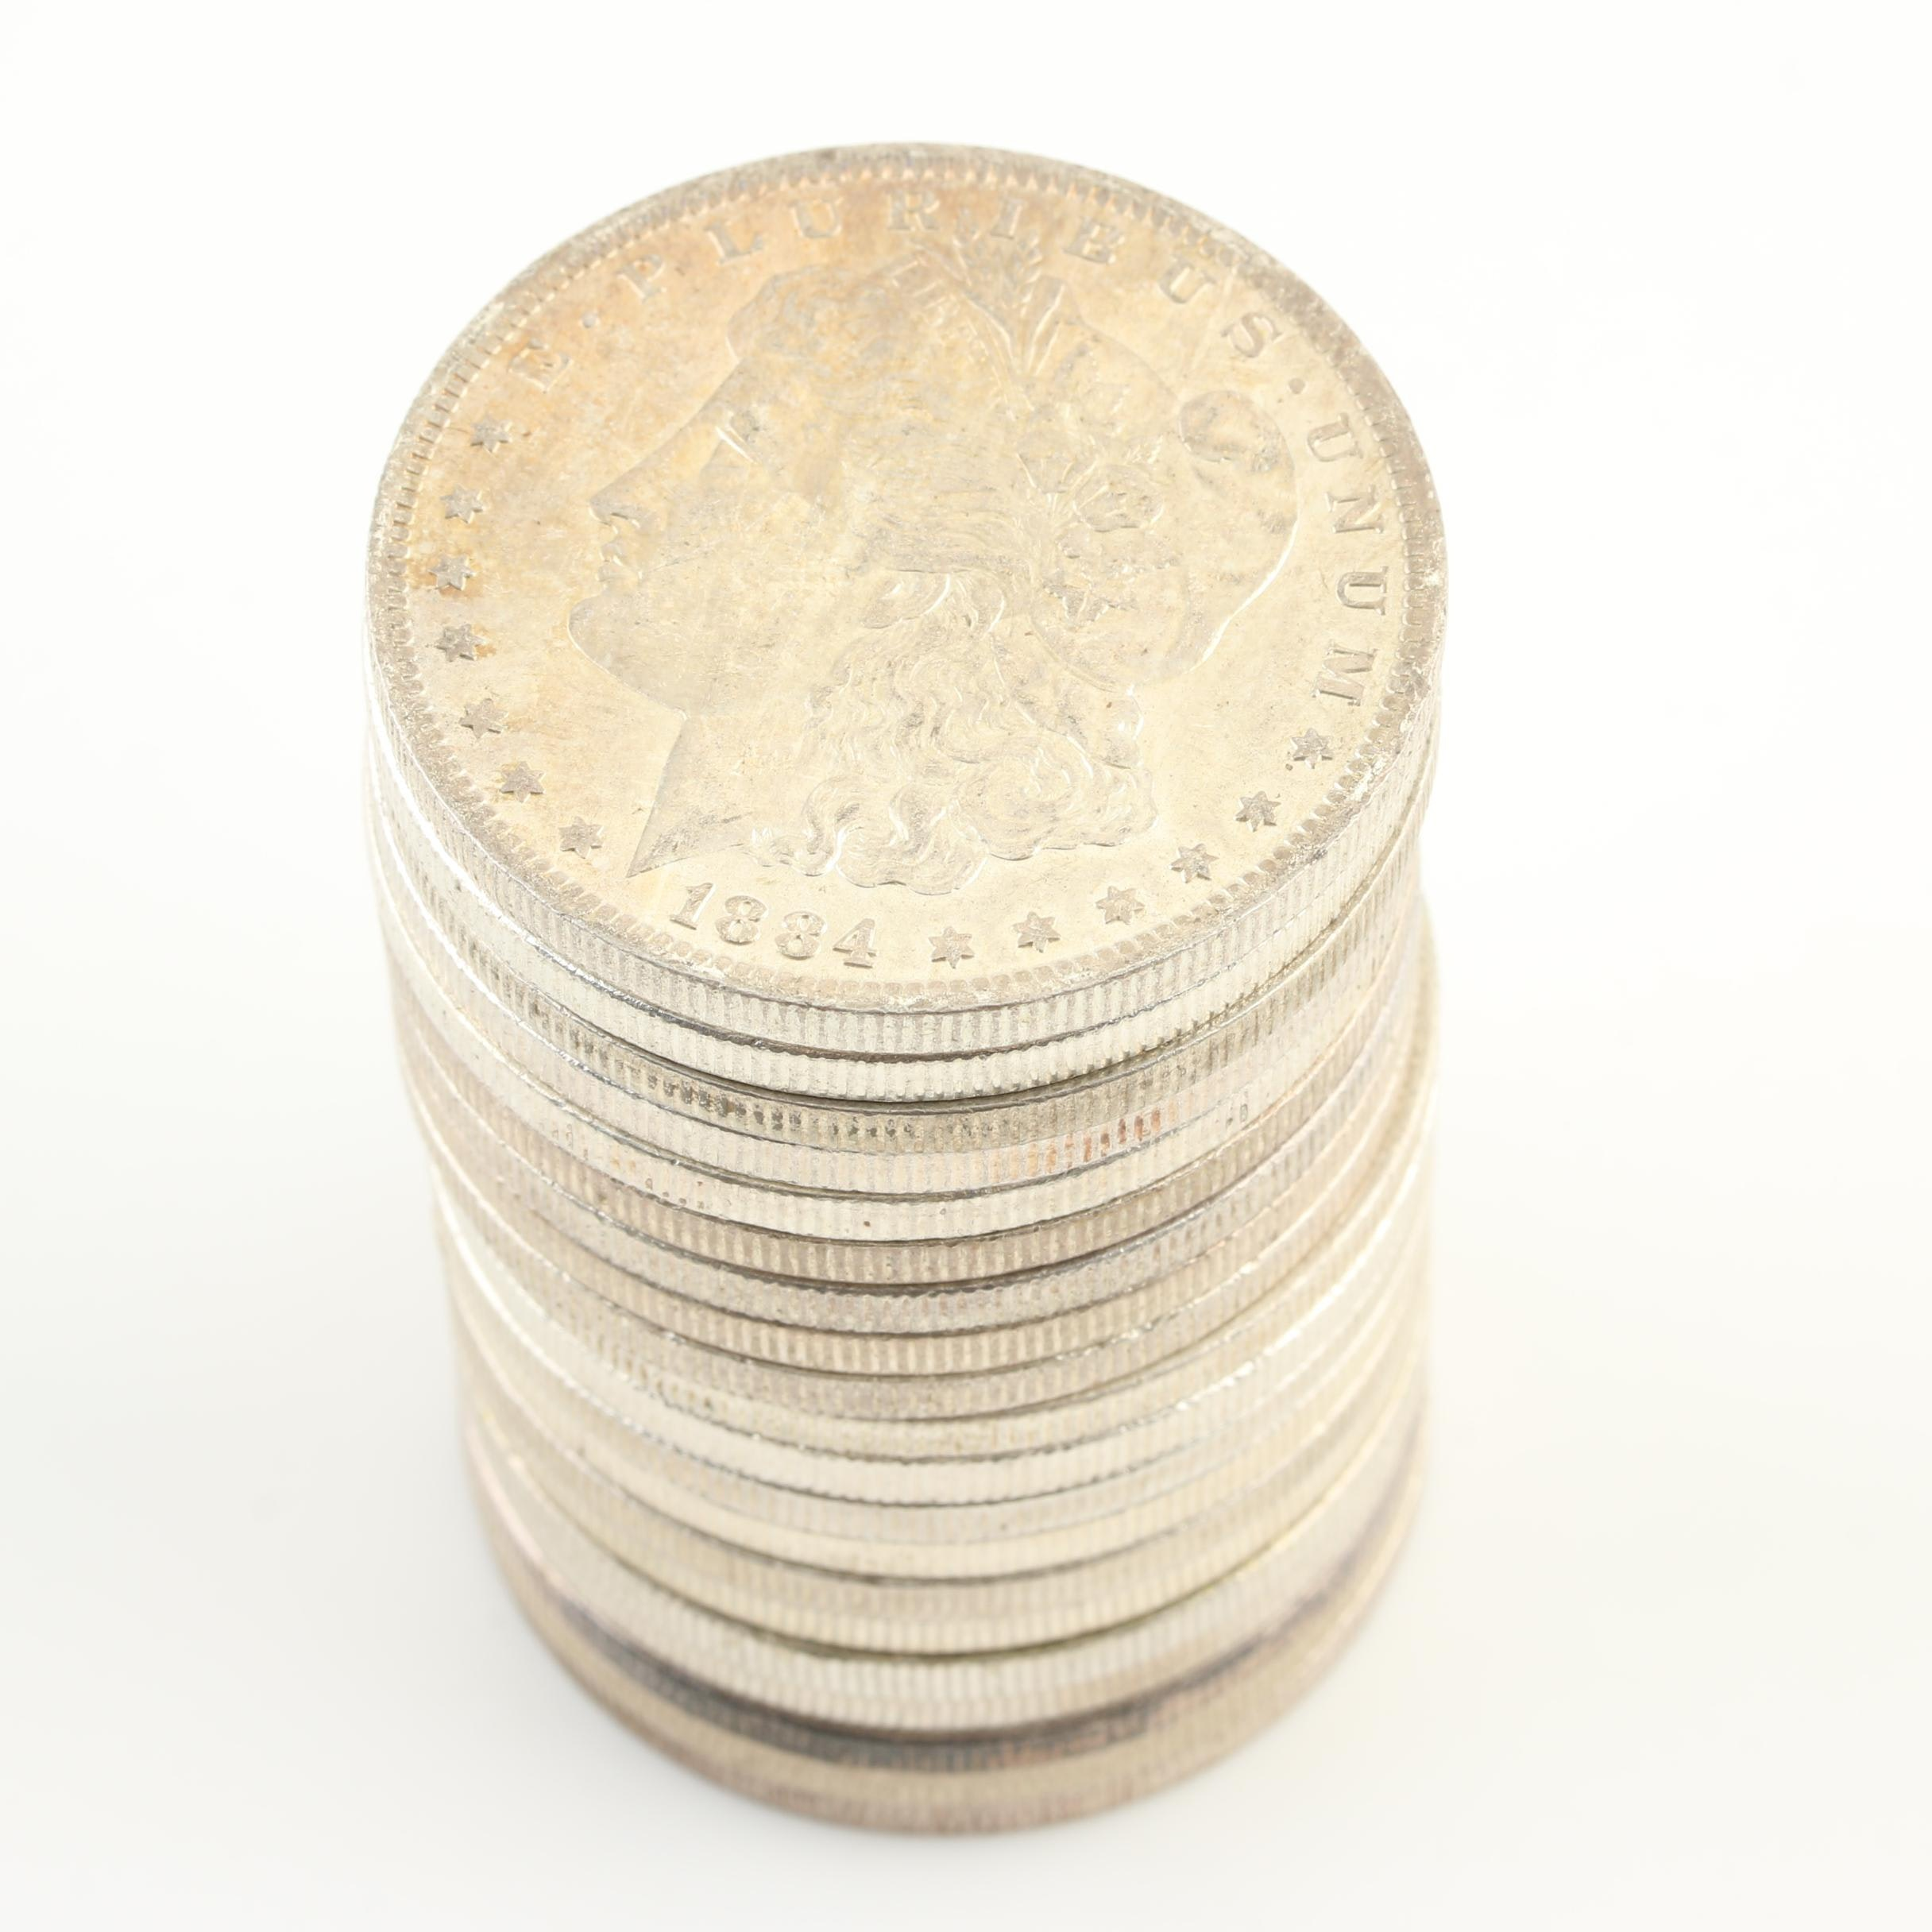 Group of Twenty Uncirculated 1884-O Silver Morgan Dollars